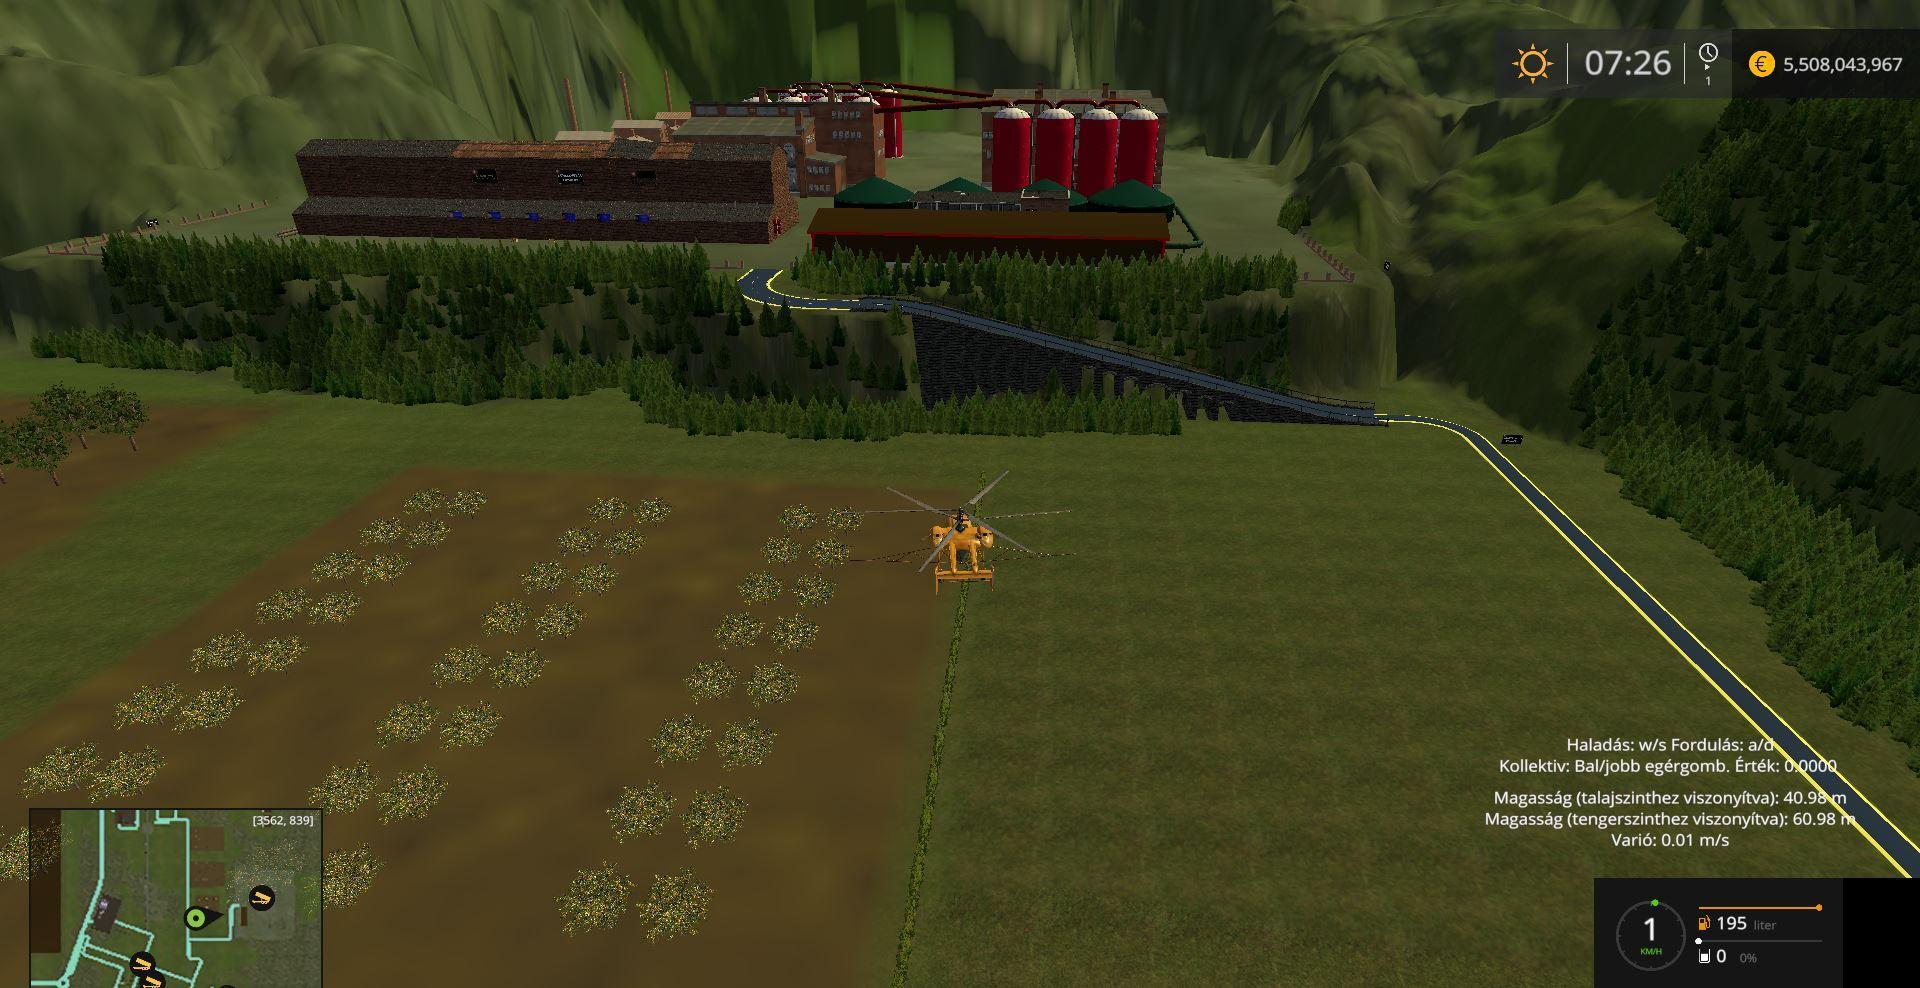 farming simulator 17 symbols guide